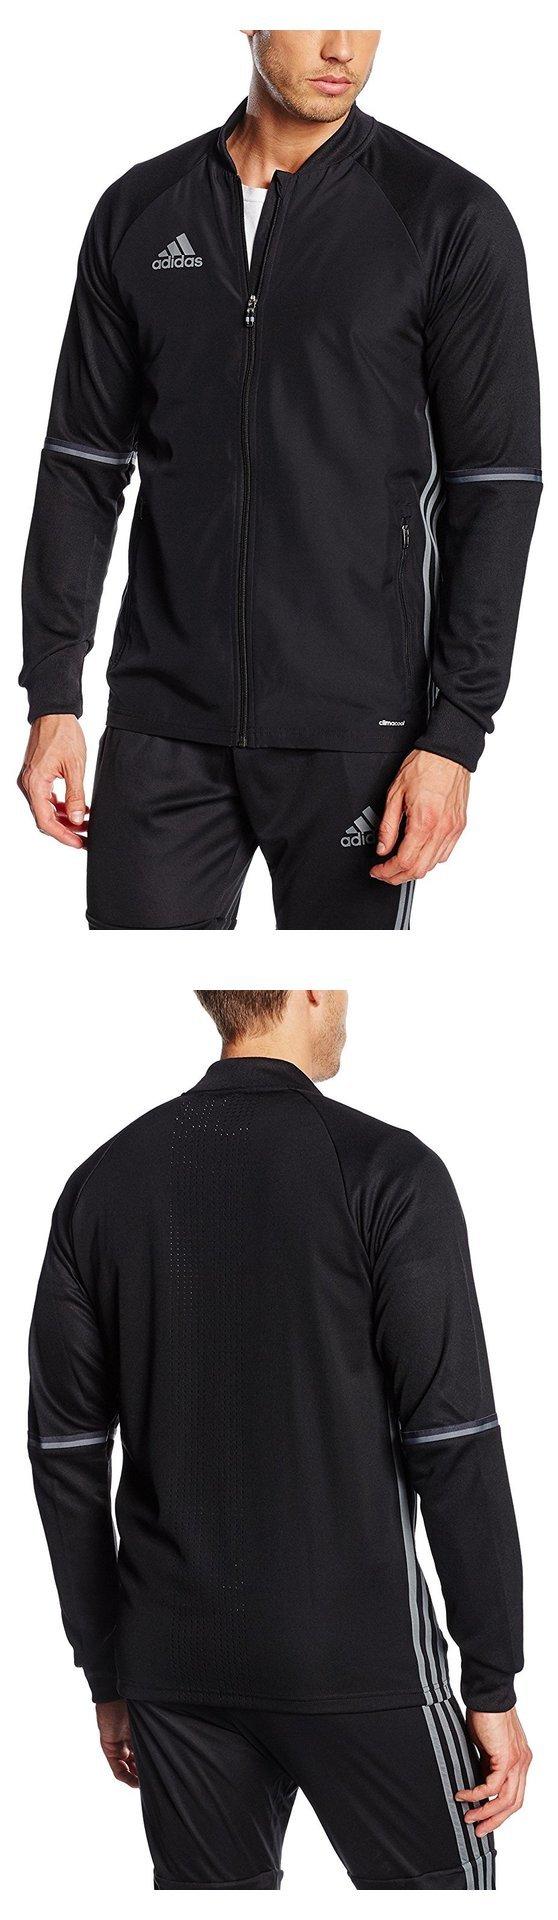 11ba37cd18  44.11 - Adidas Condivo 16 Plain Training Jacket - Adult - Black Grey -  Black